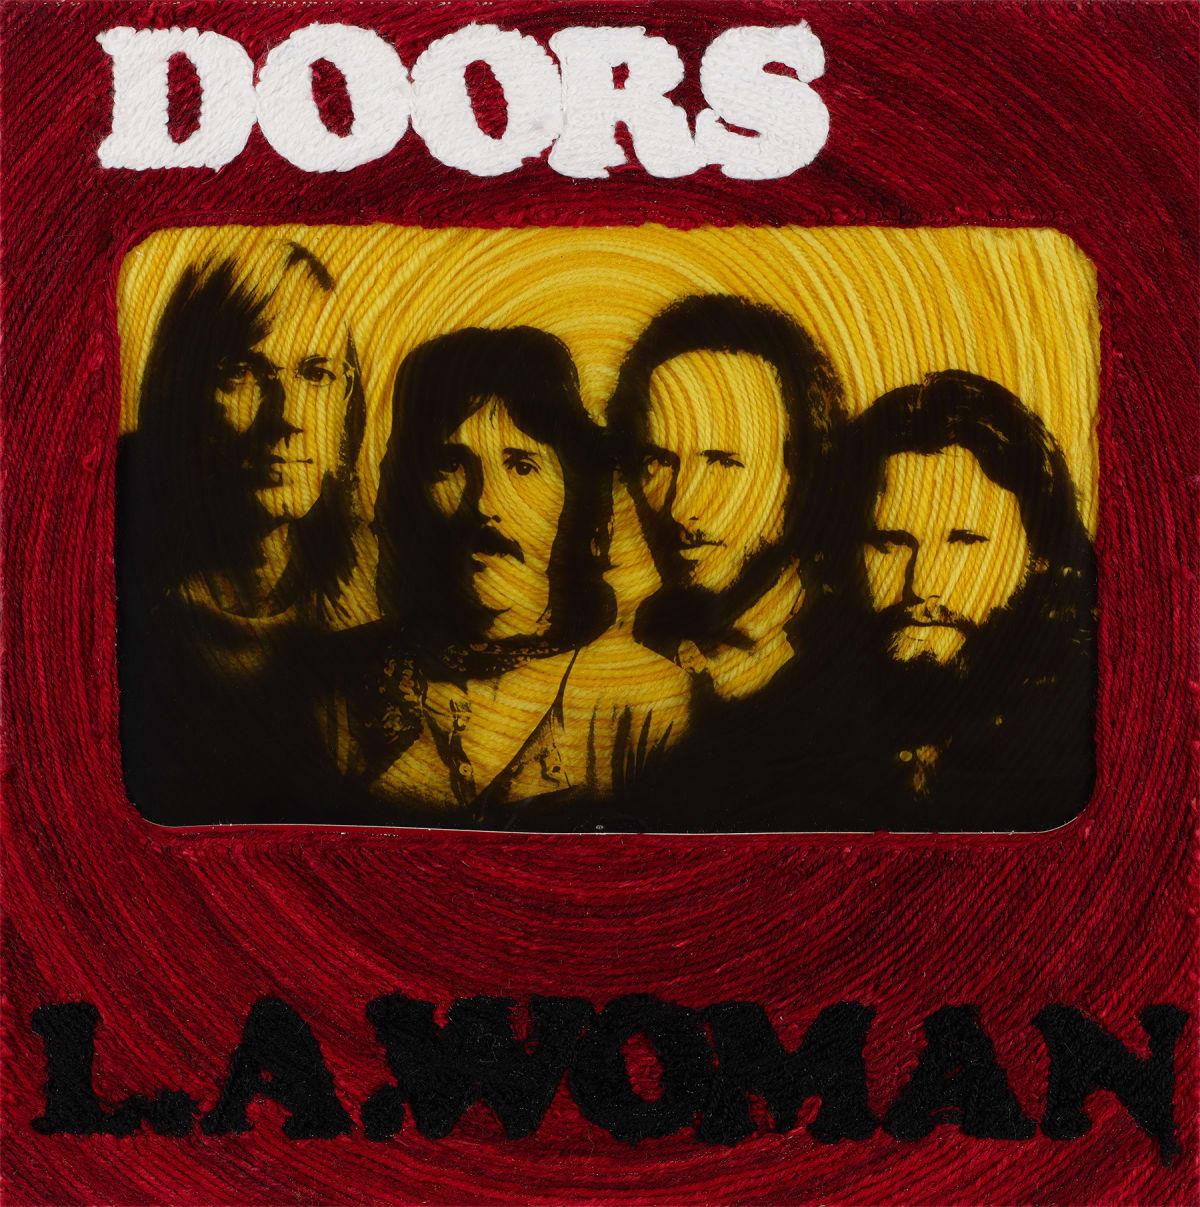 Stephen Wilson, L.A. Woman, The Doors, 2020